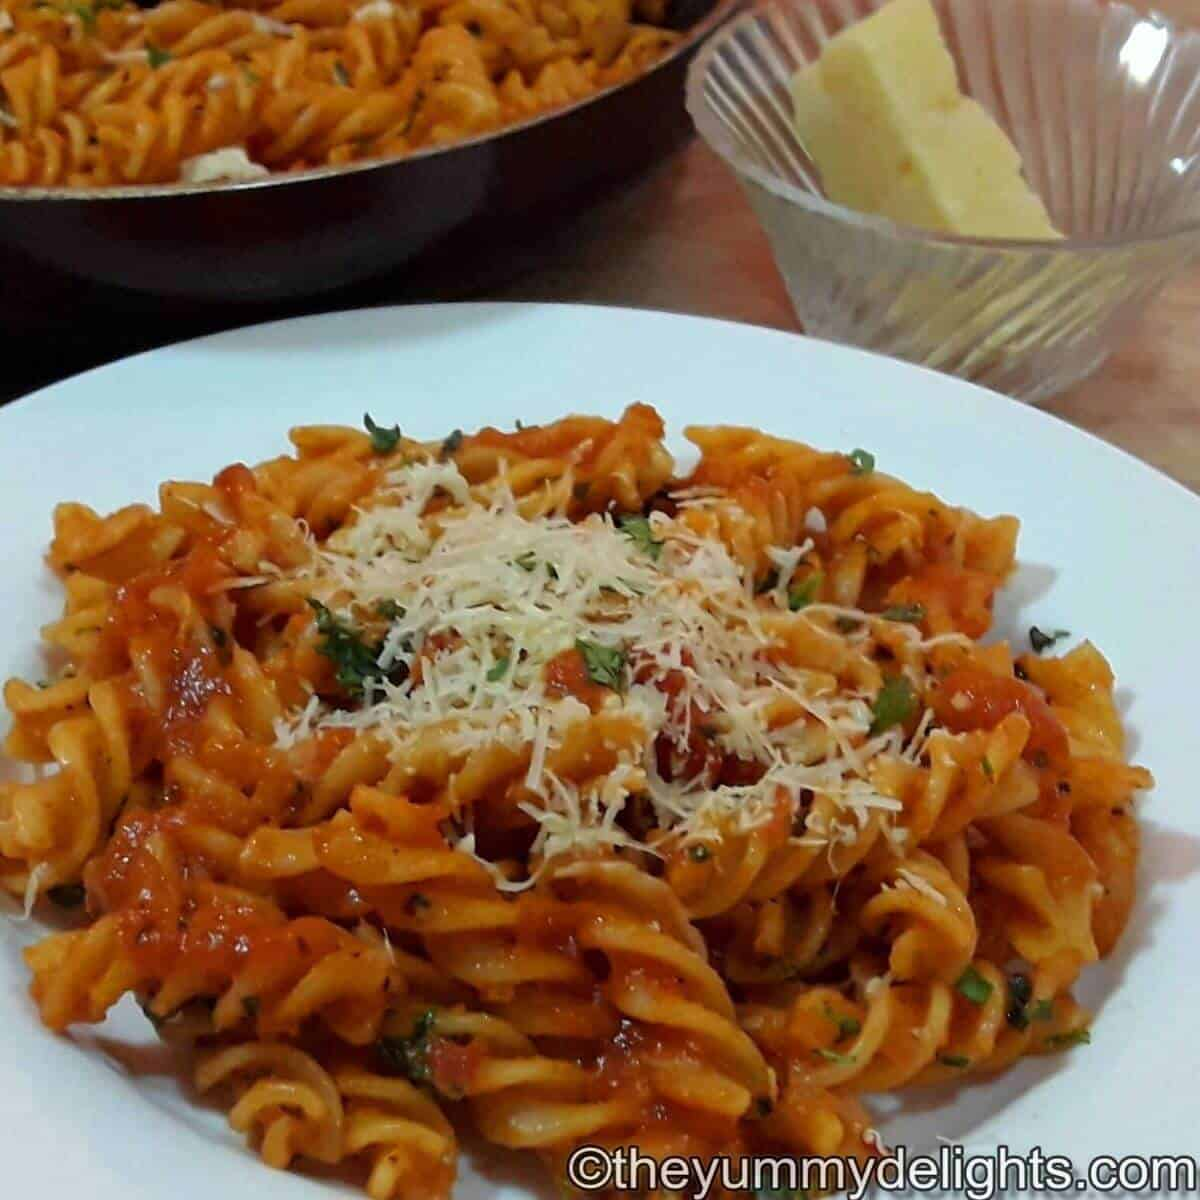 tomato pasta served in a white bowl.